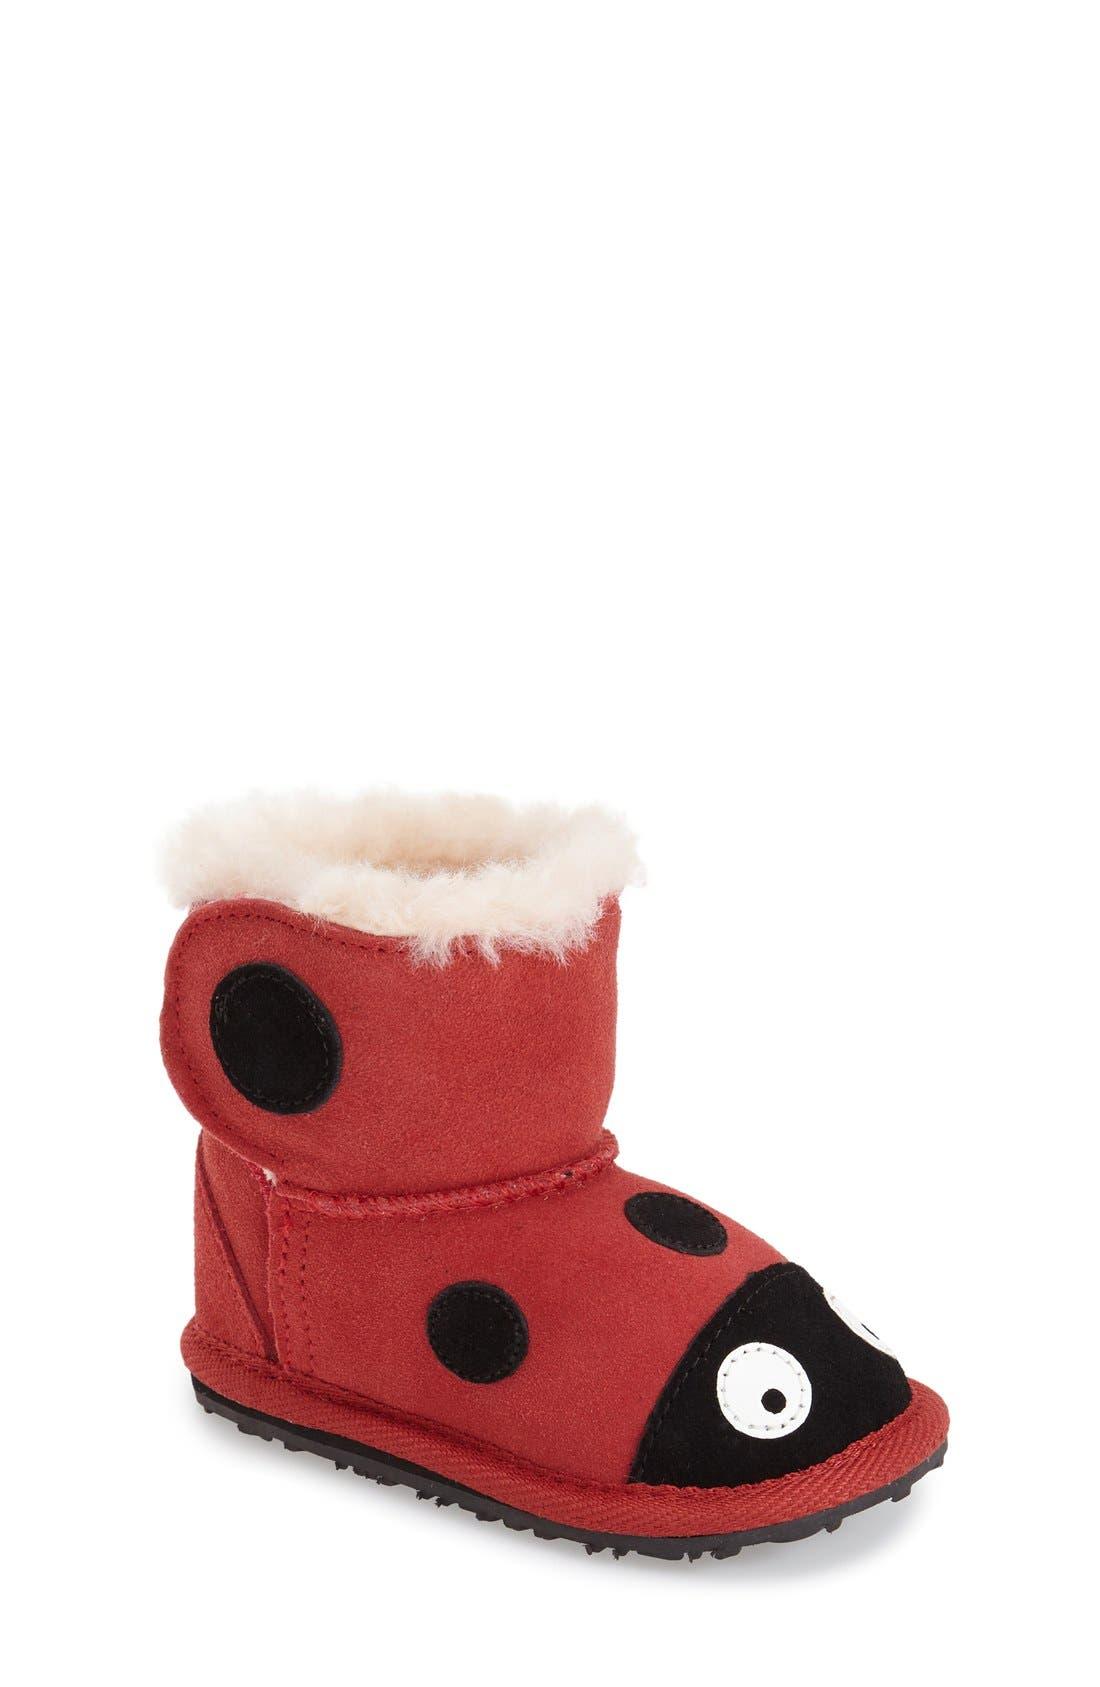 Main Image - EMU Australia 'Ladybug' Boot (Baby & Walker)